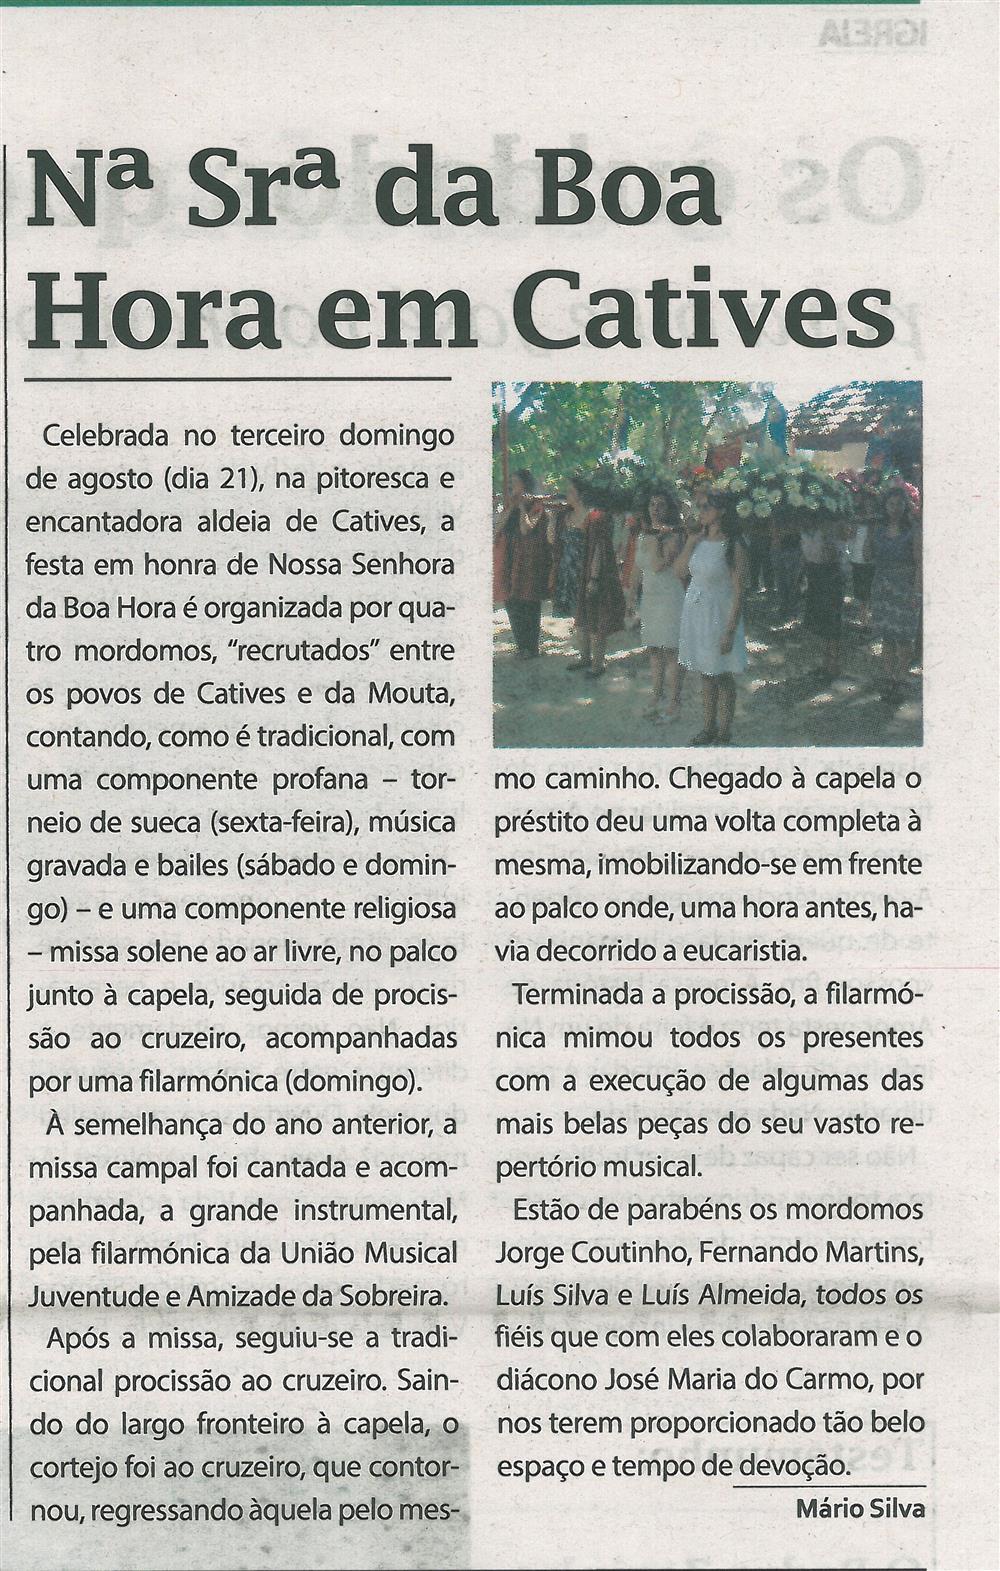 TV-set.'16-p.10-N.ª Sr.ª da Boa Hora em Catives.jpg